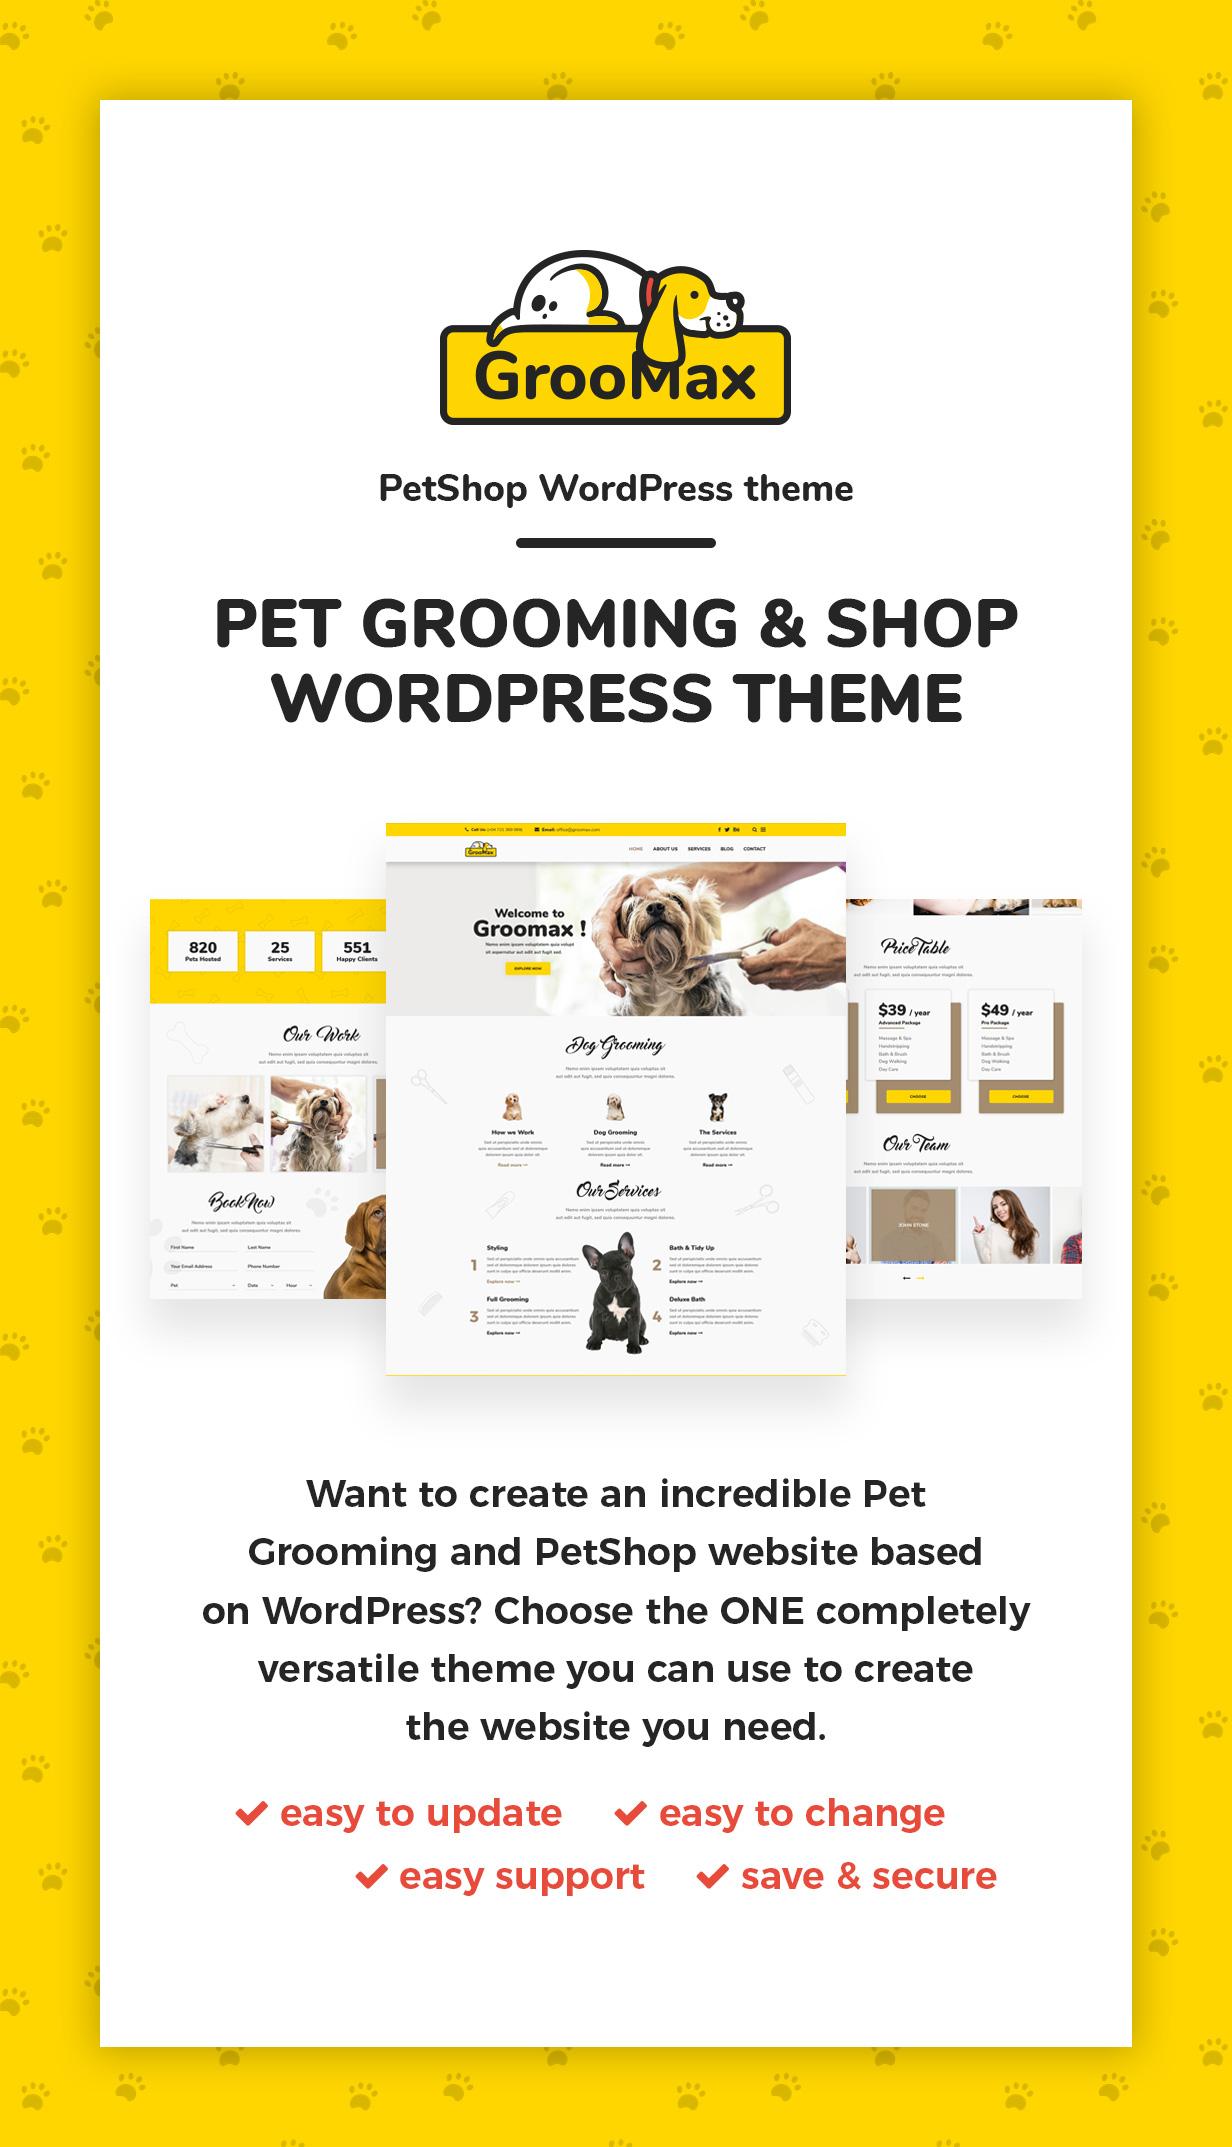 Groomax - Pet Grooming & Shop WordPress Theme - 1